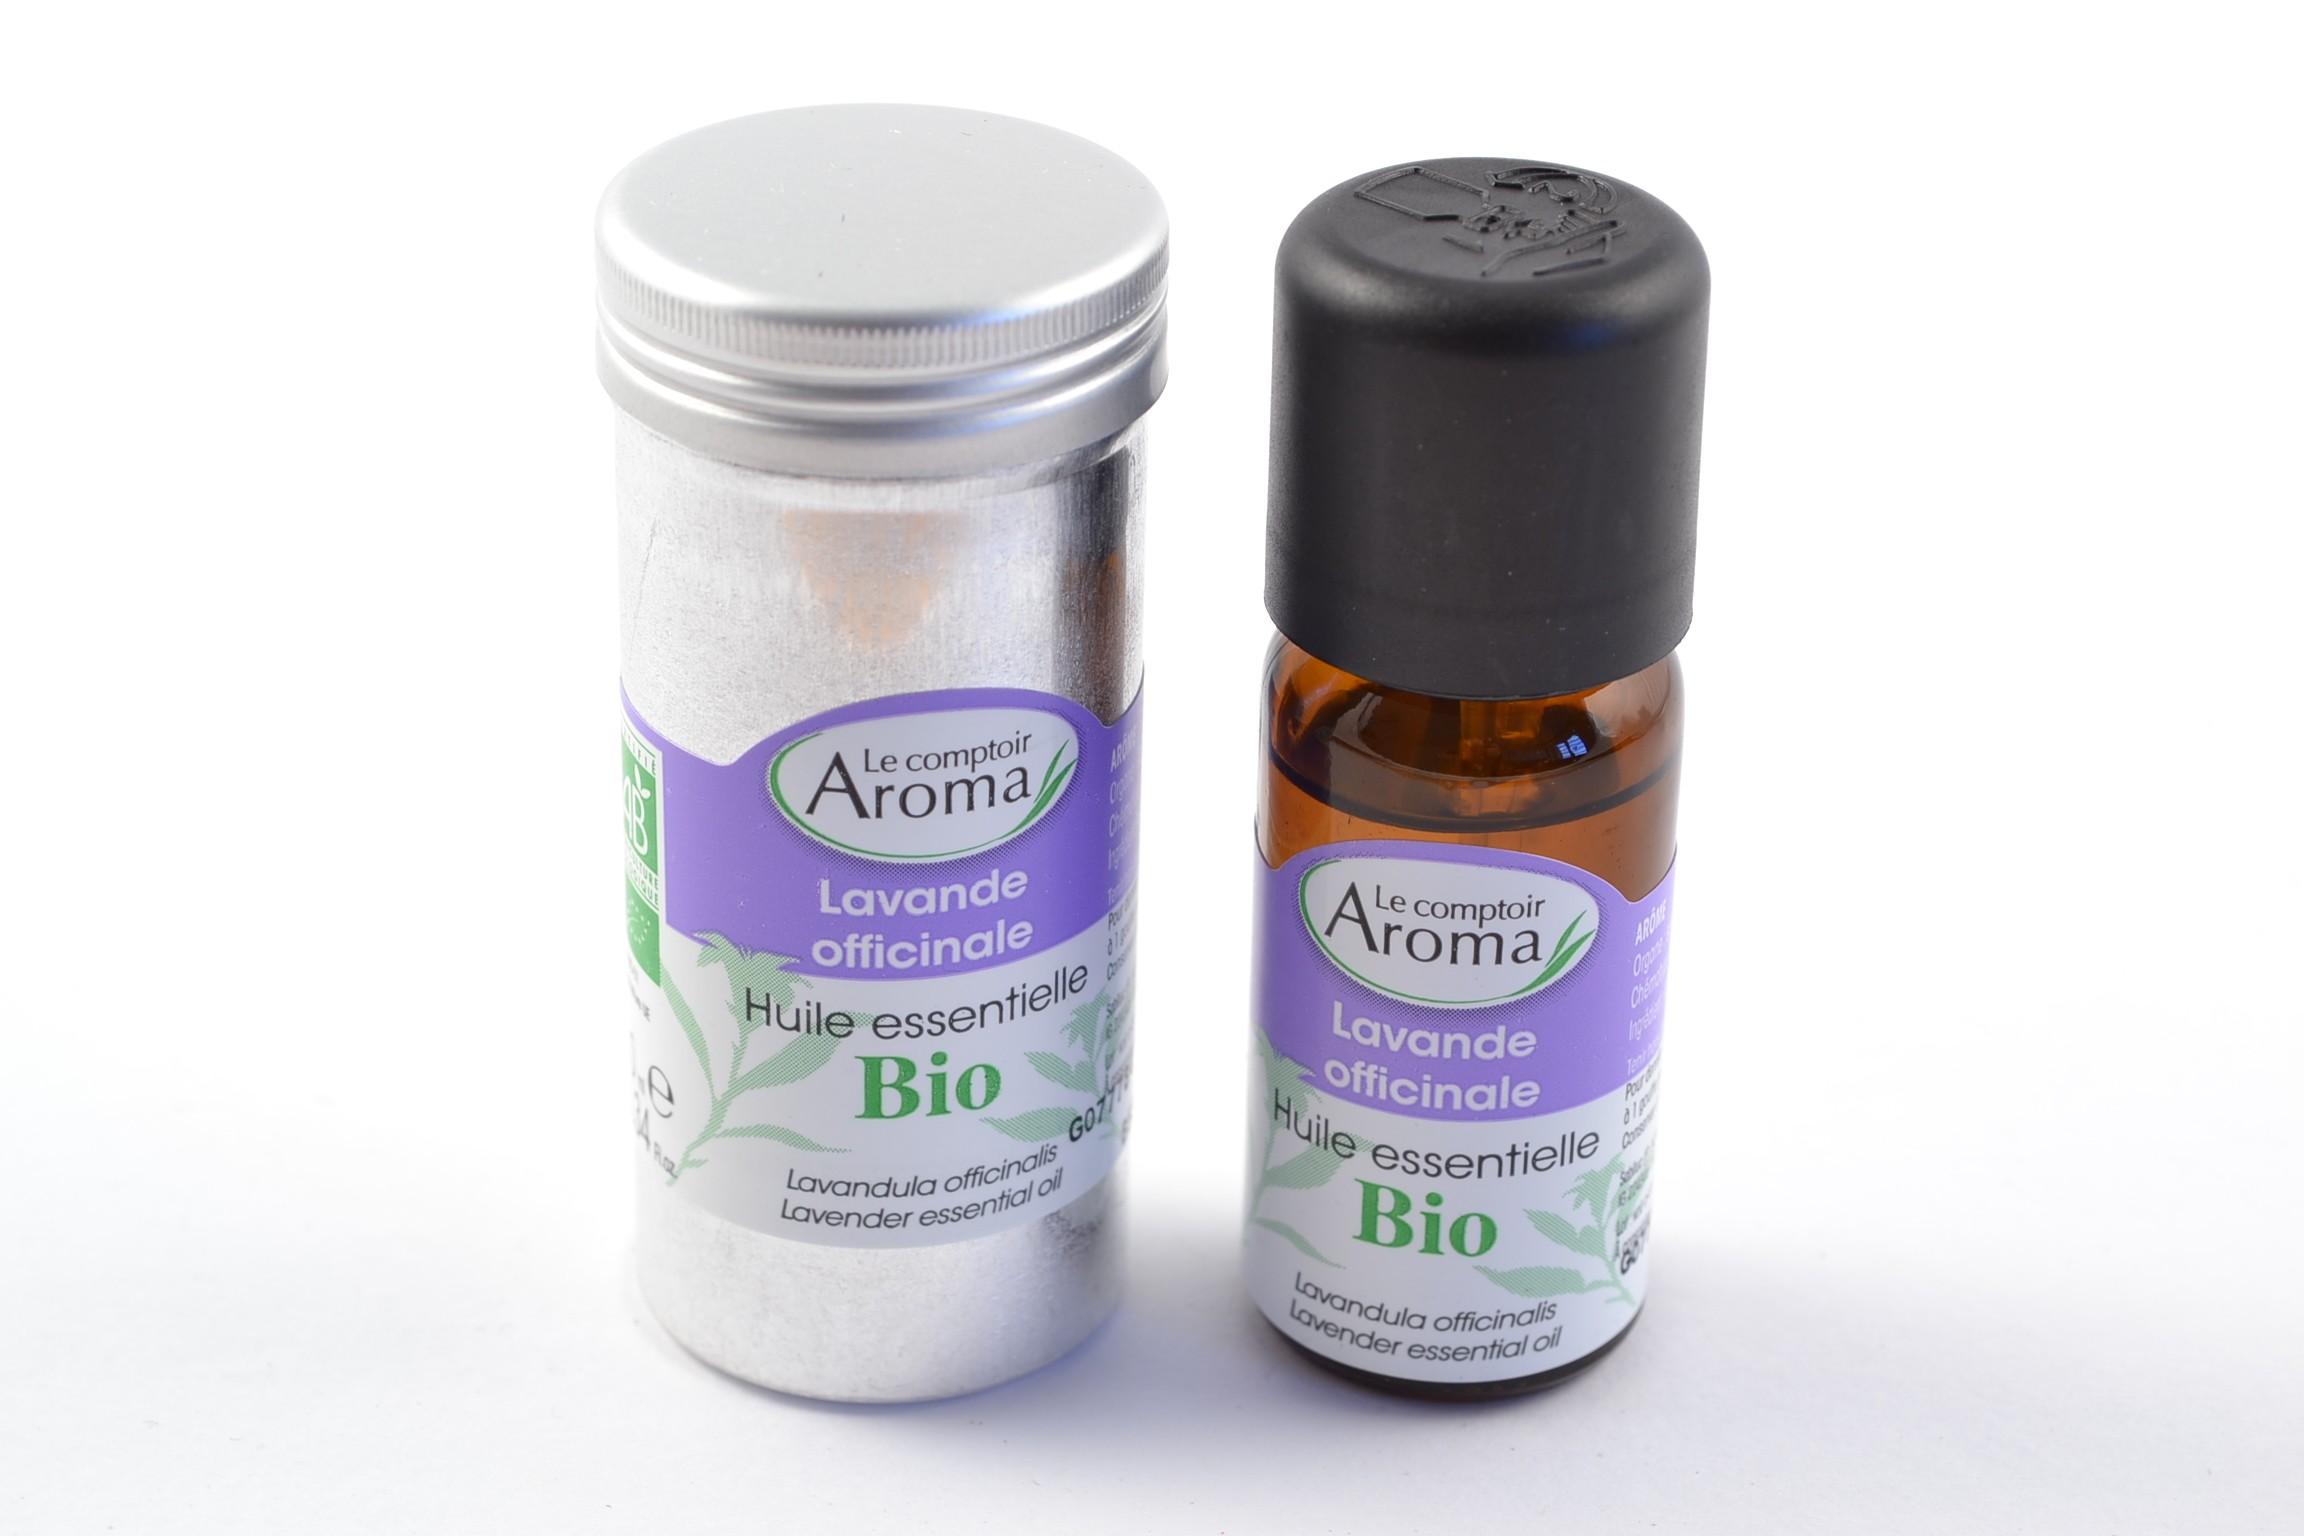 lavande officinale huile essentielle